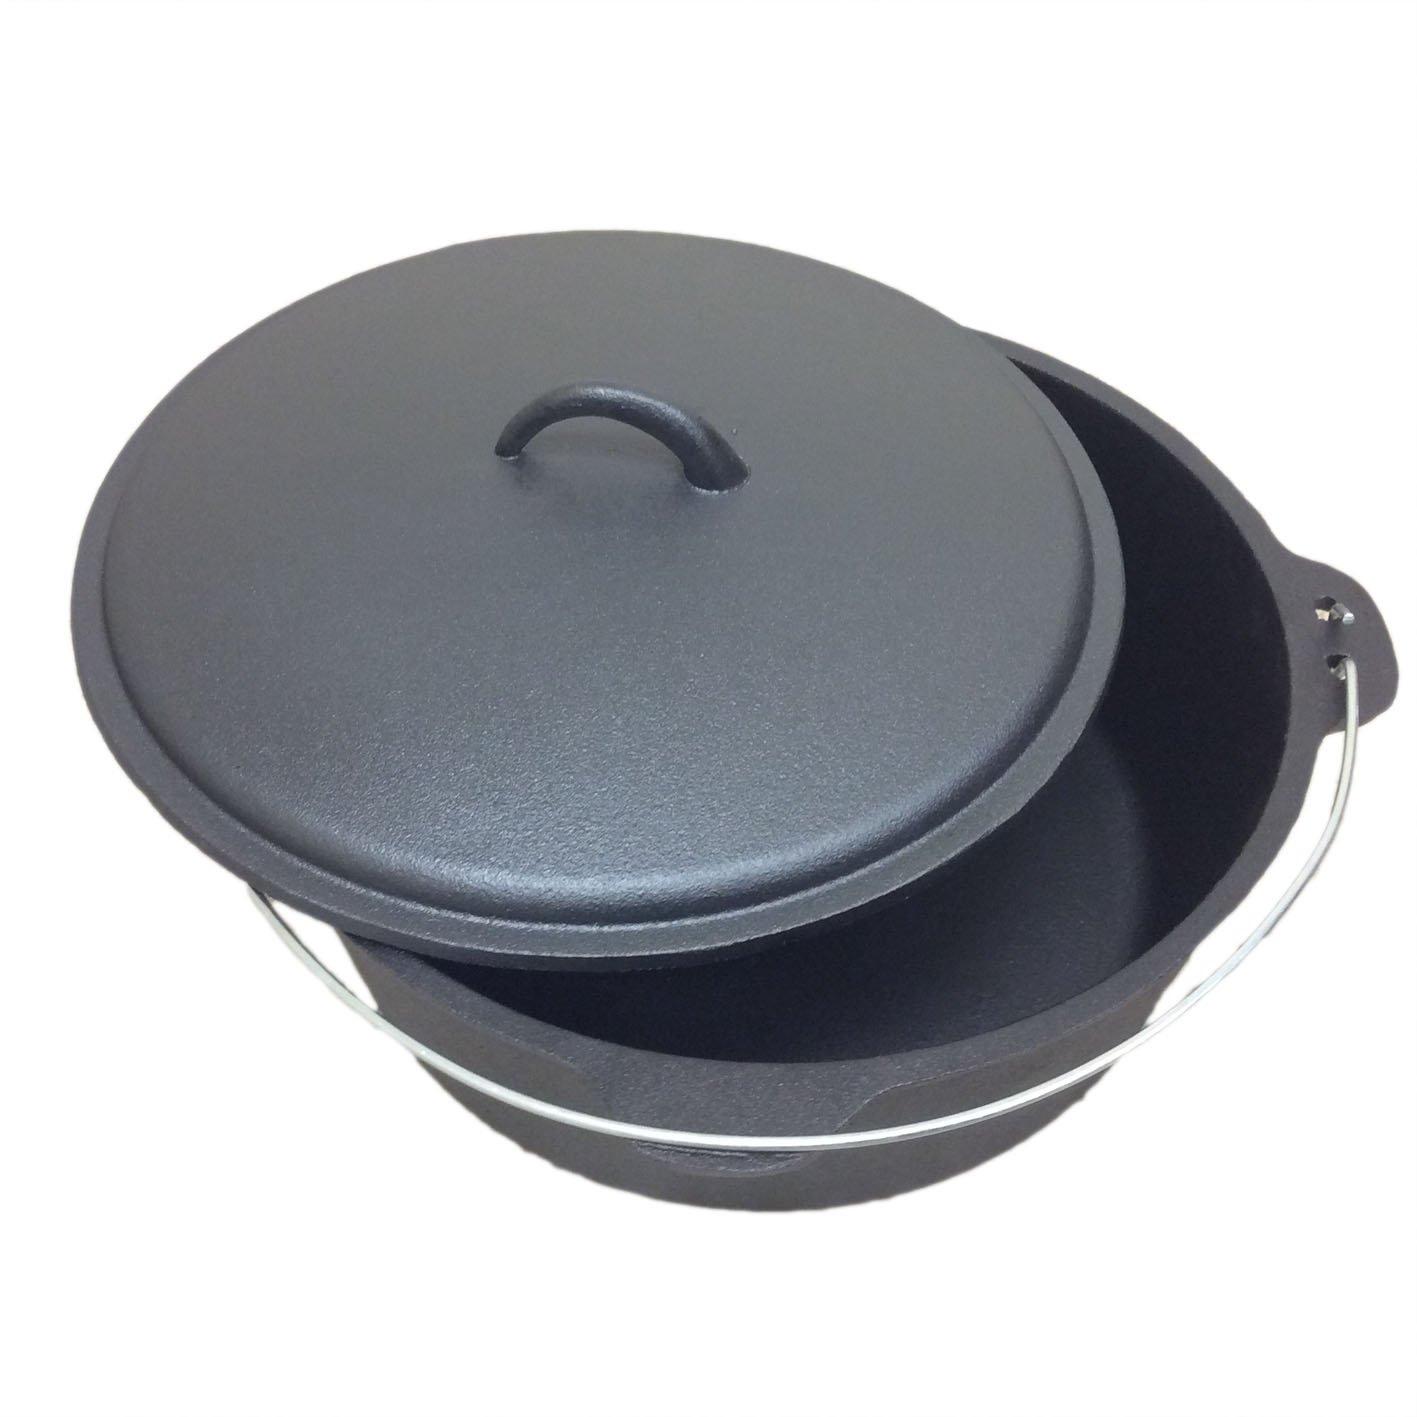 cuisiland Seasoned 9 Quart 12 Inch Cast Iron Dutch Oven Dome Lid